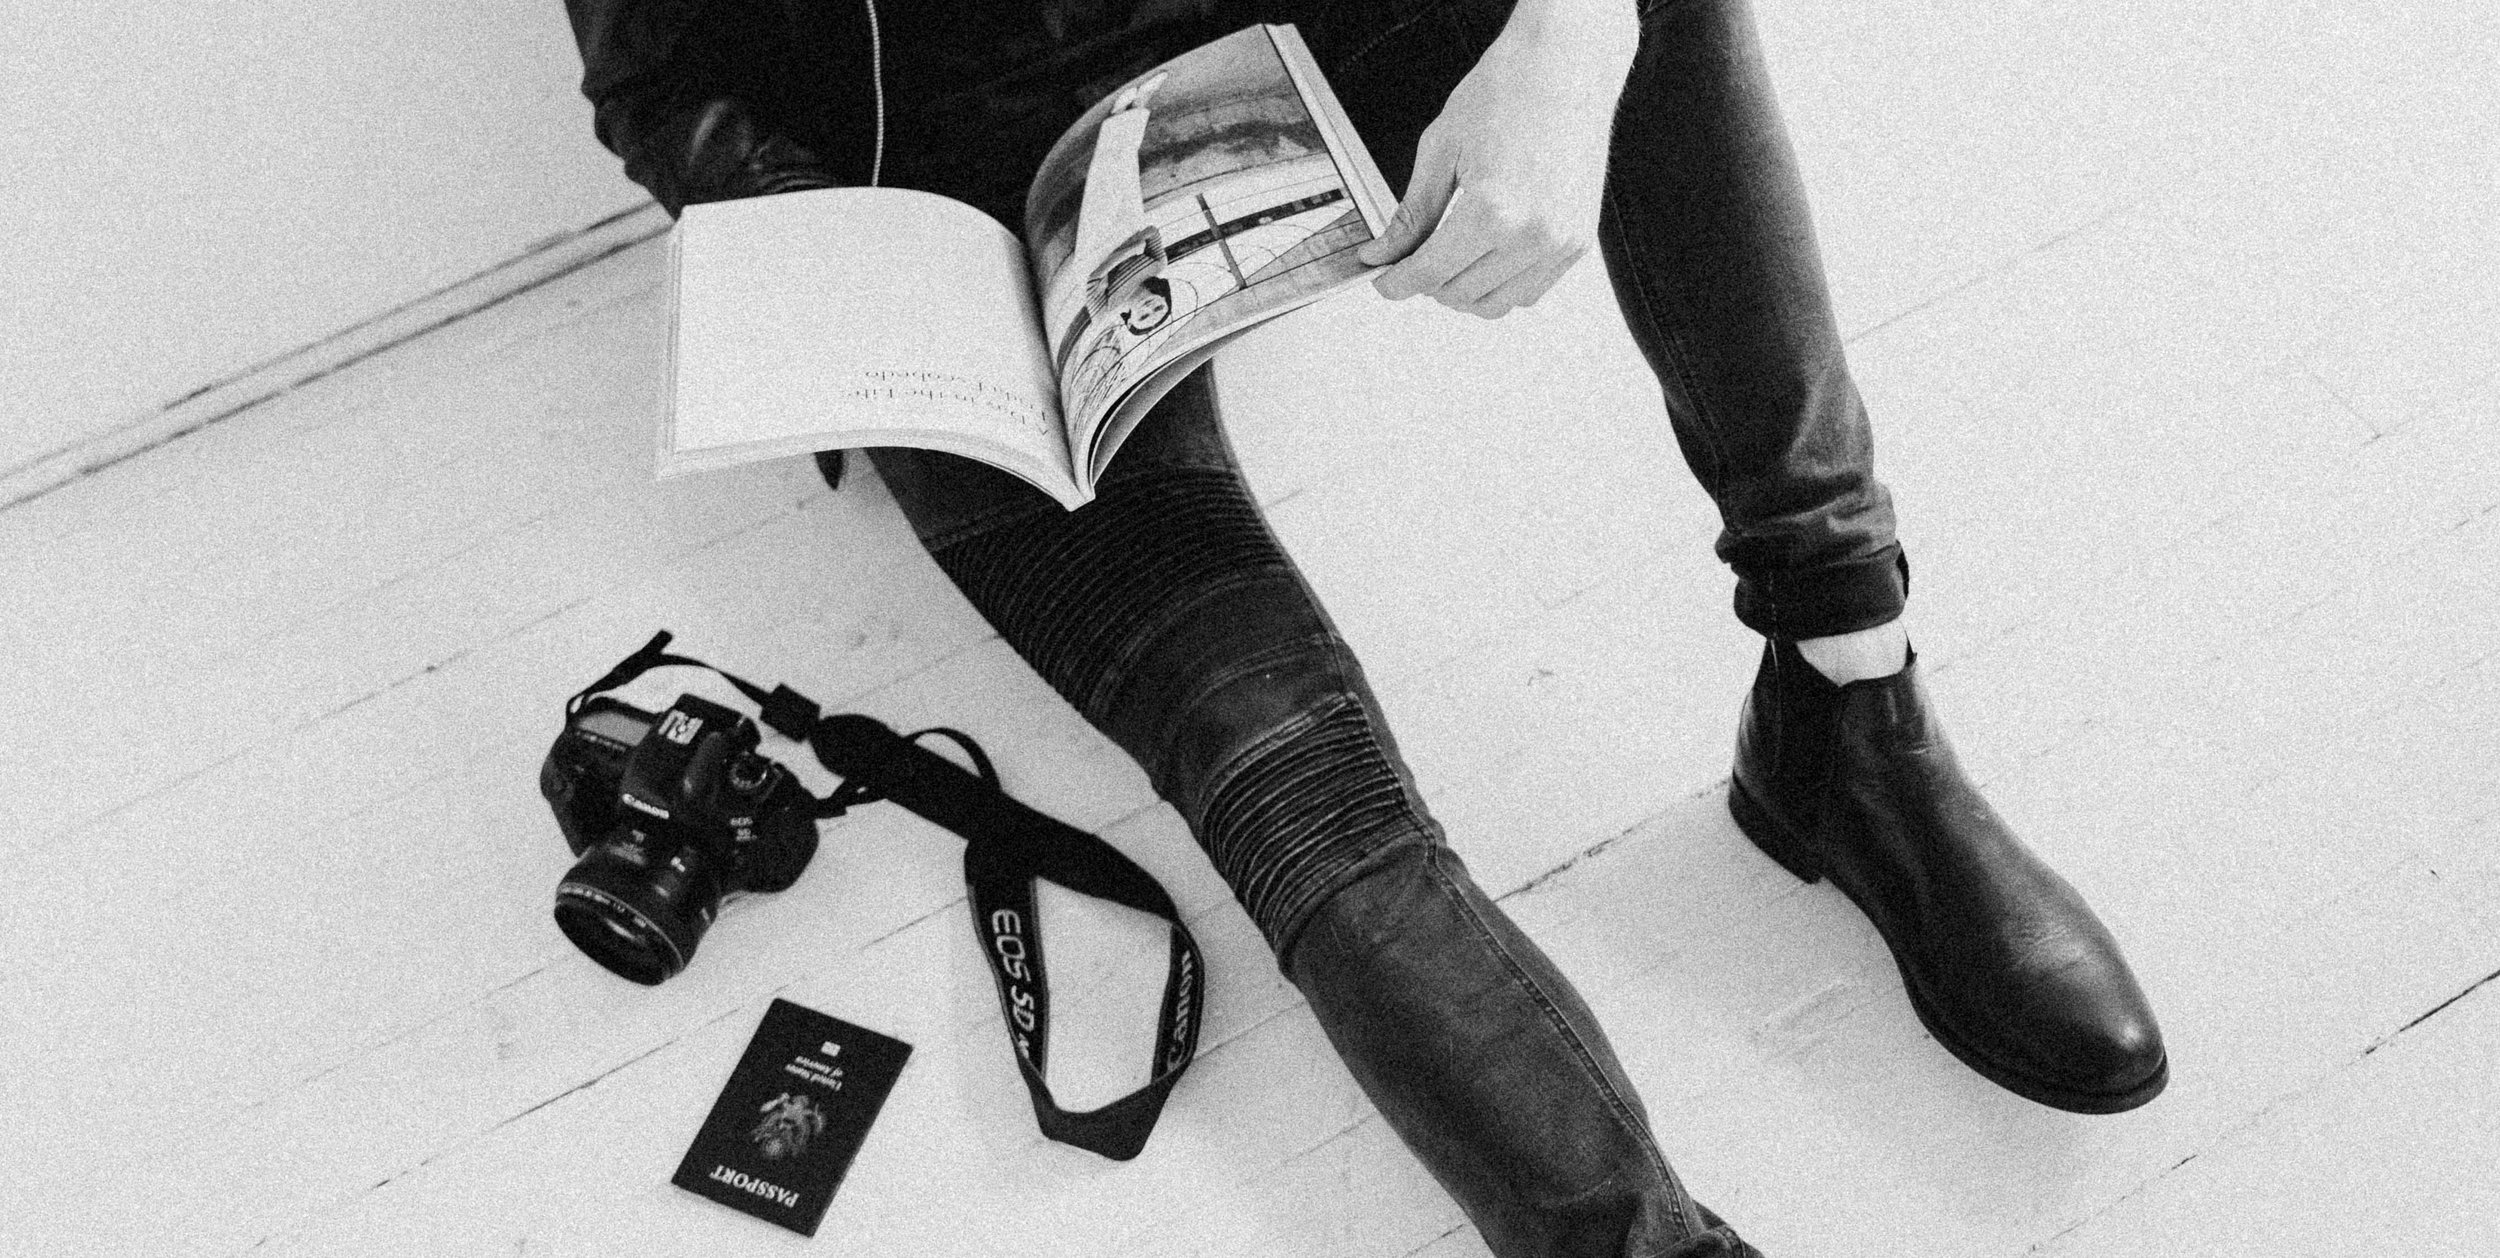 destination-photography-and-videography-international-workshops-egypt-jordan-michael-cozzens-2.jpg